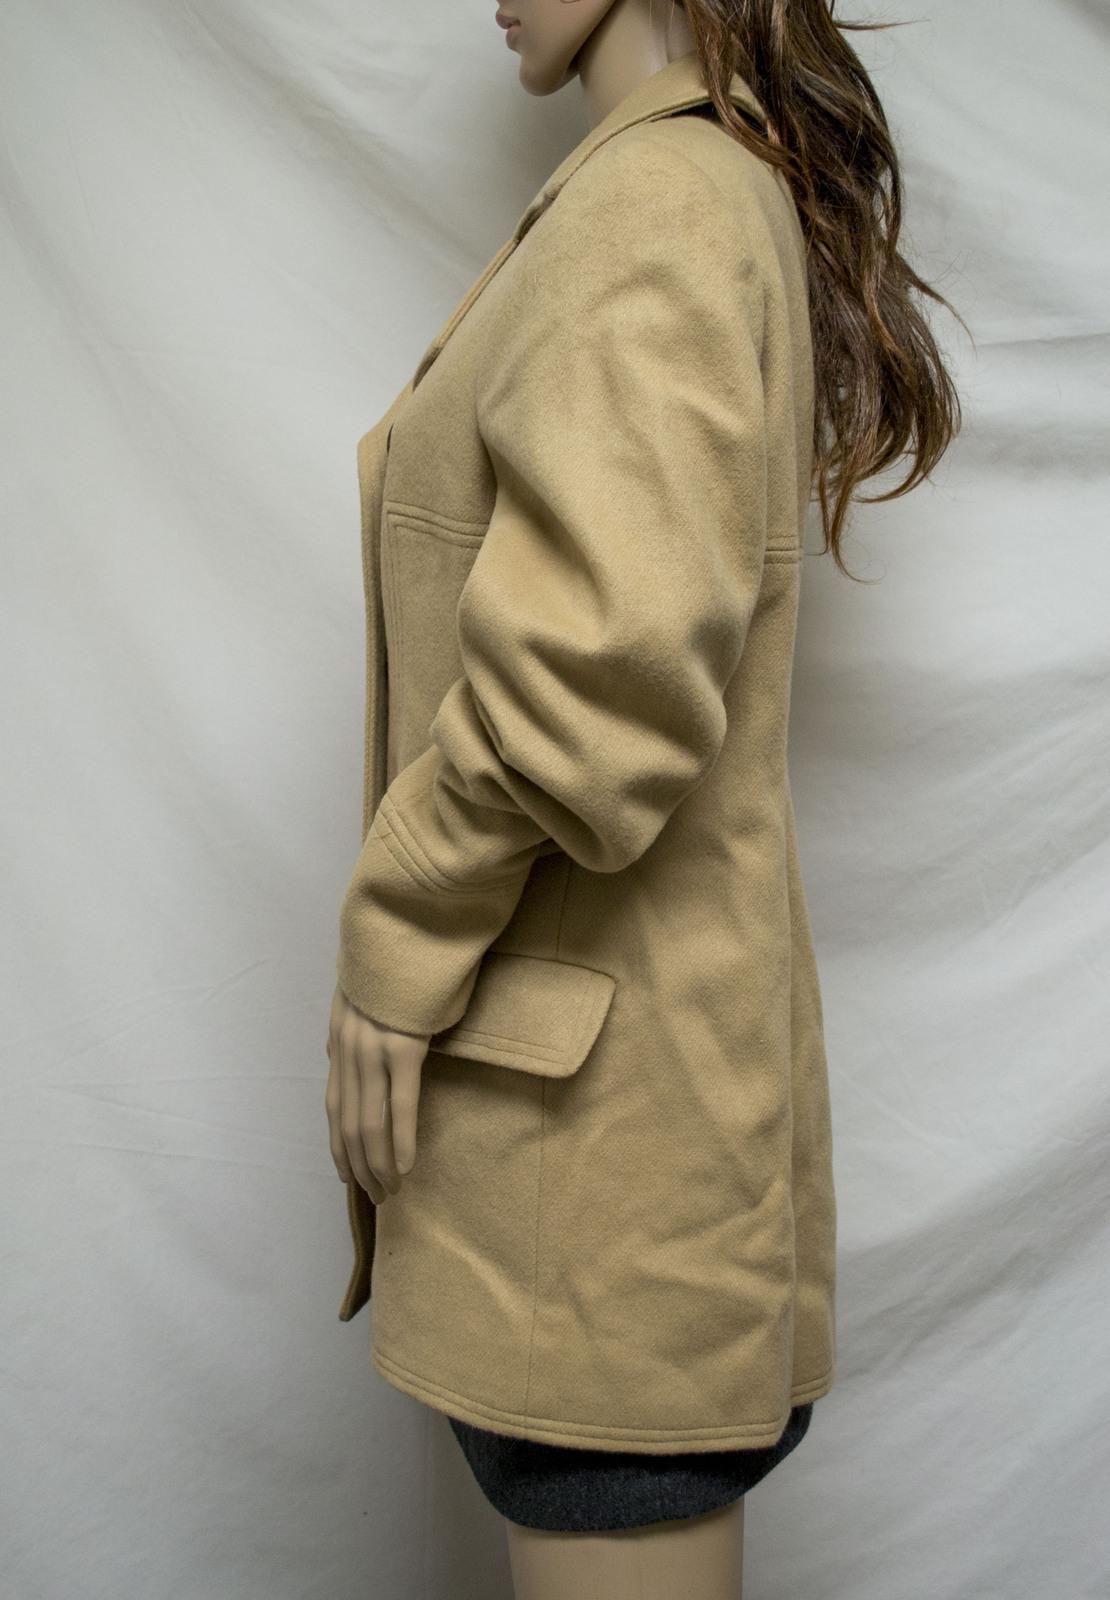 Gaspare Ferrara Women's Wool Blend Coat Tan Colored